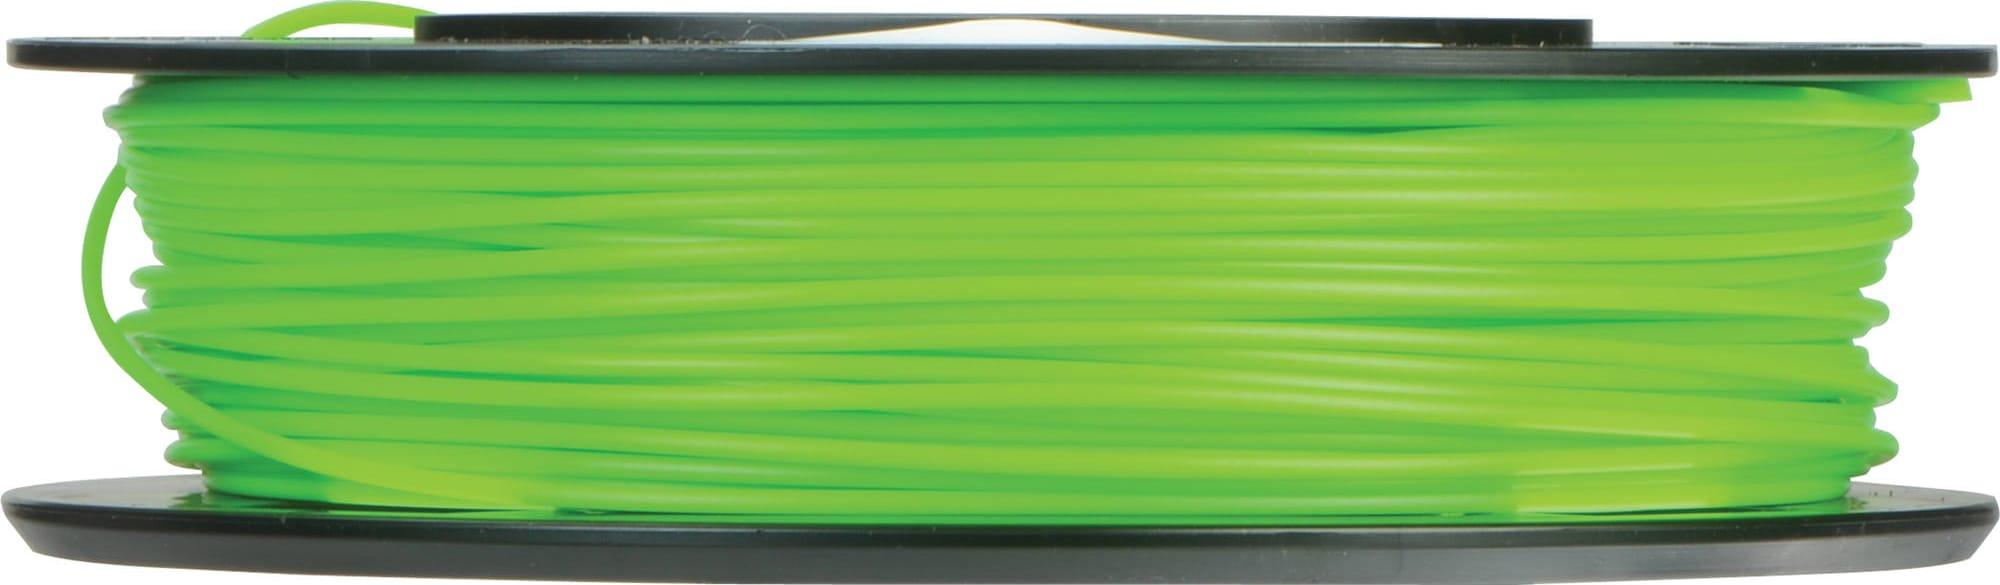 MakerBot MP06053 Neon Green PLA Filament Small Spool